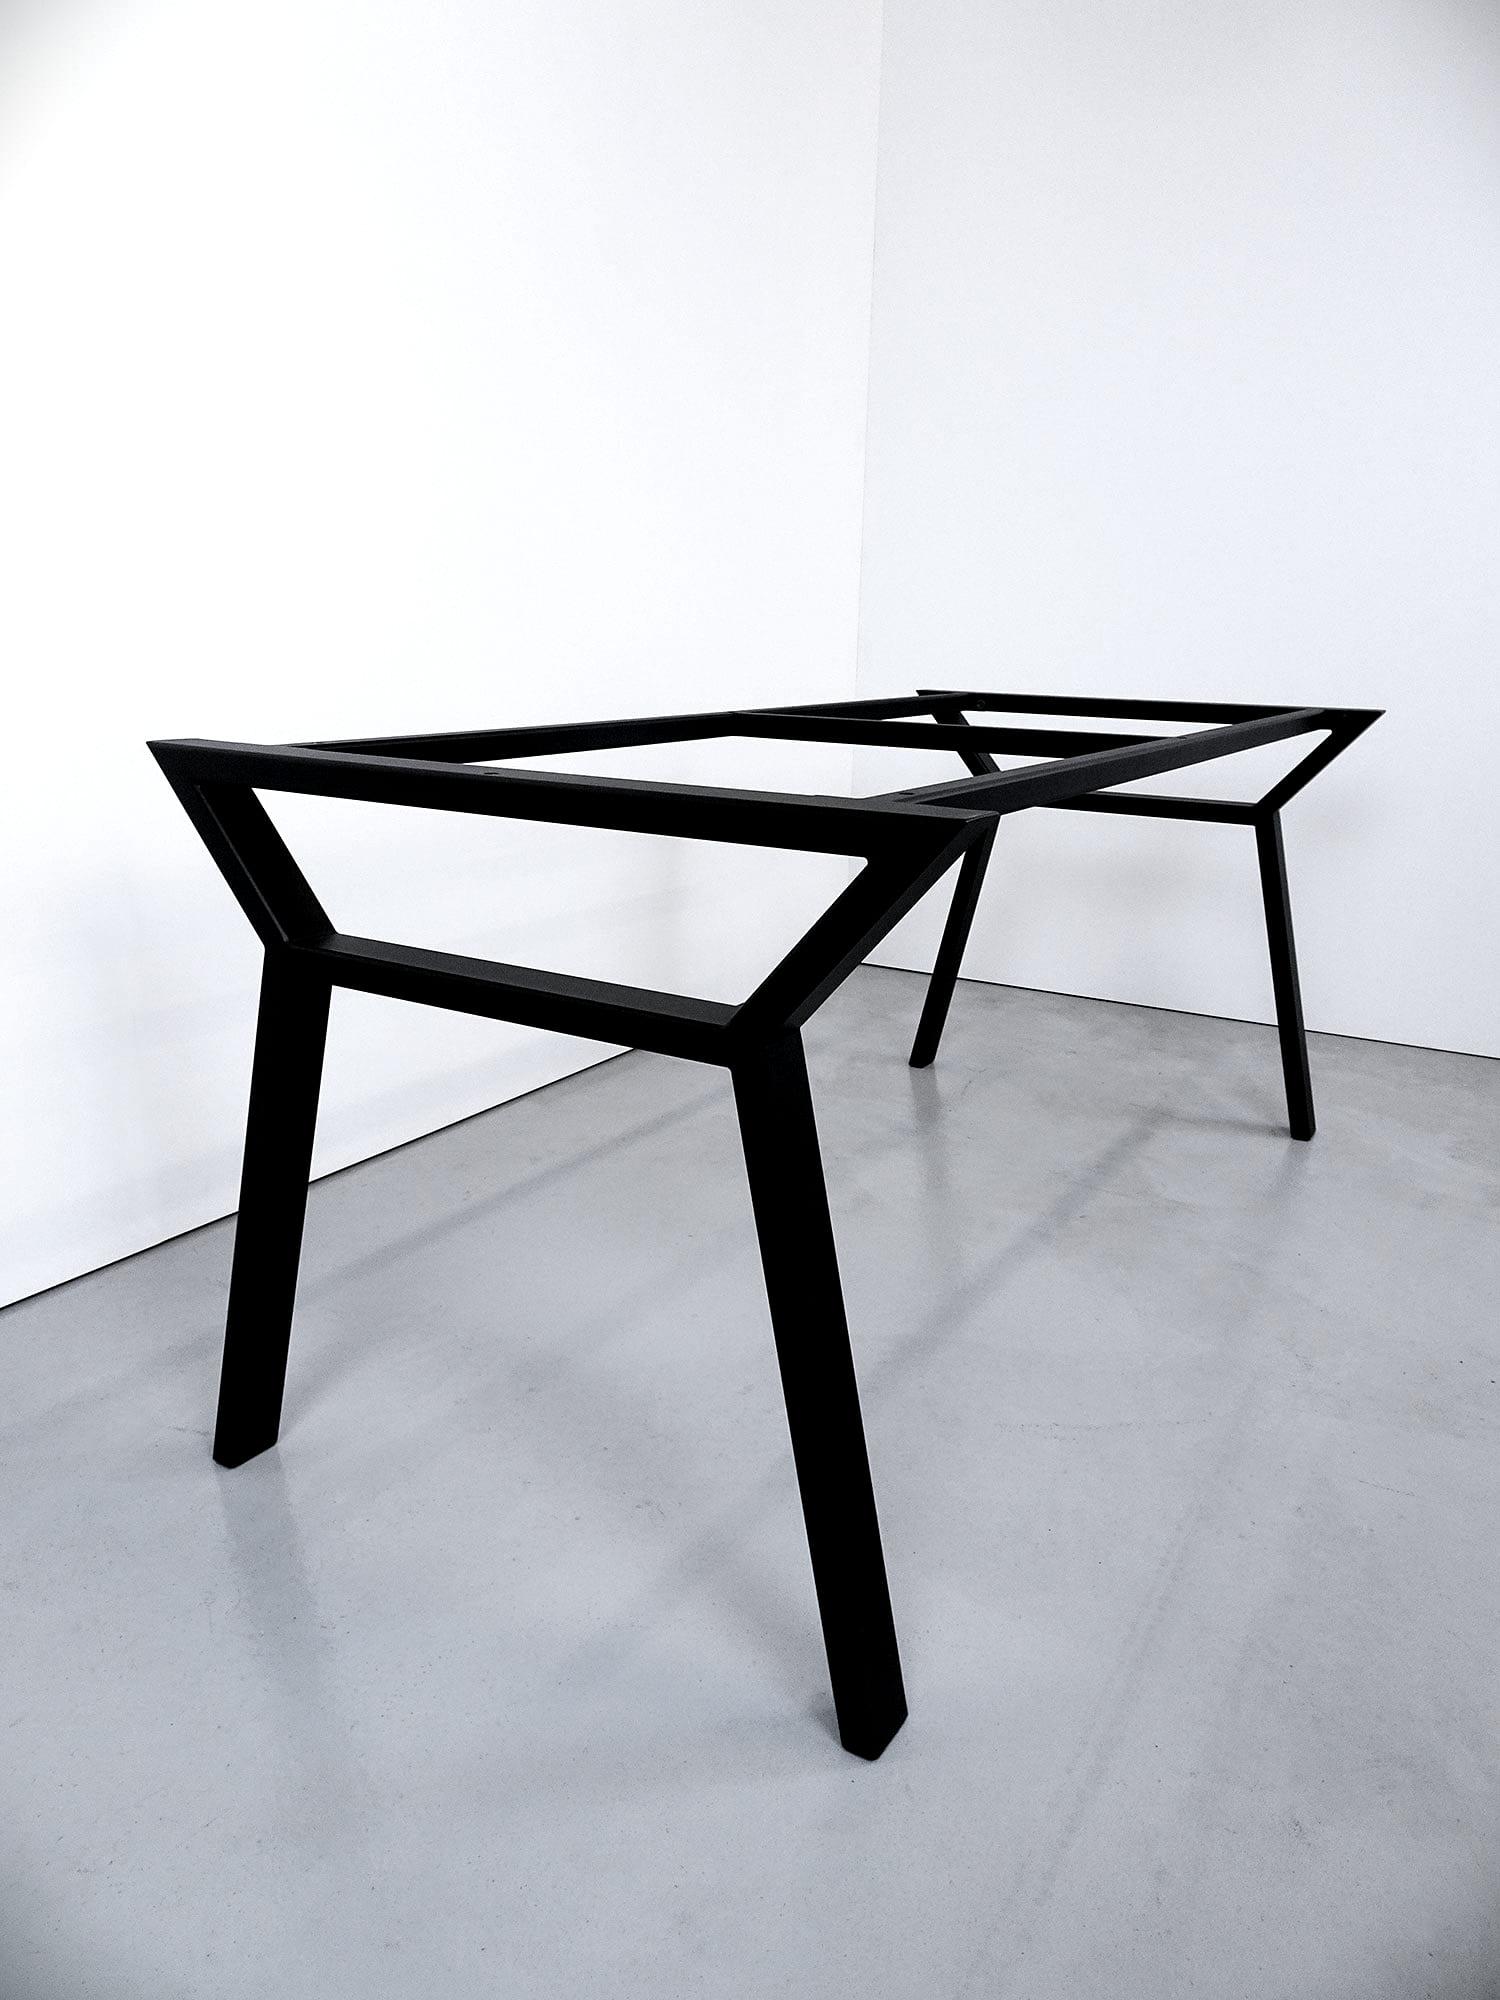 ARTMETA Pied de table Hameau acier sur mesure / Table Hameau